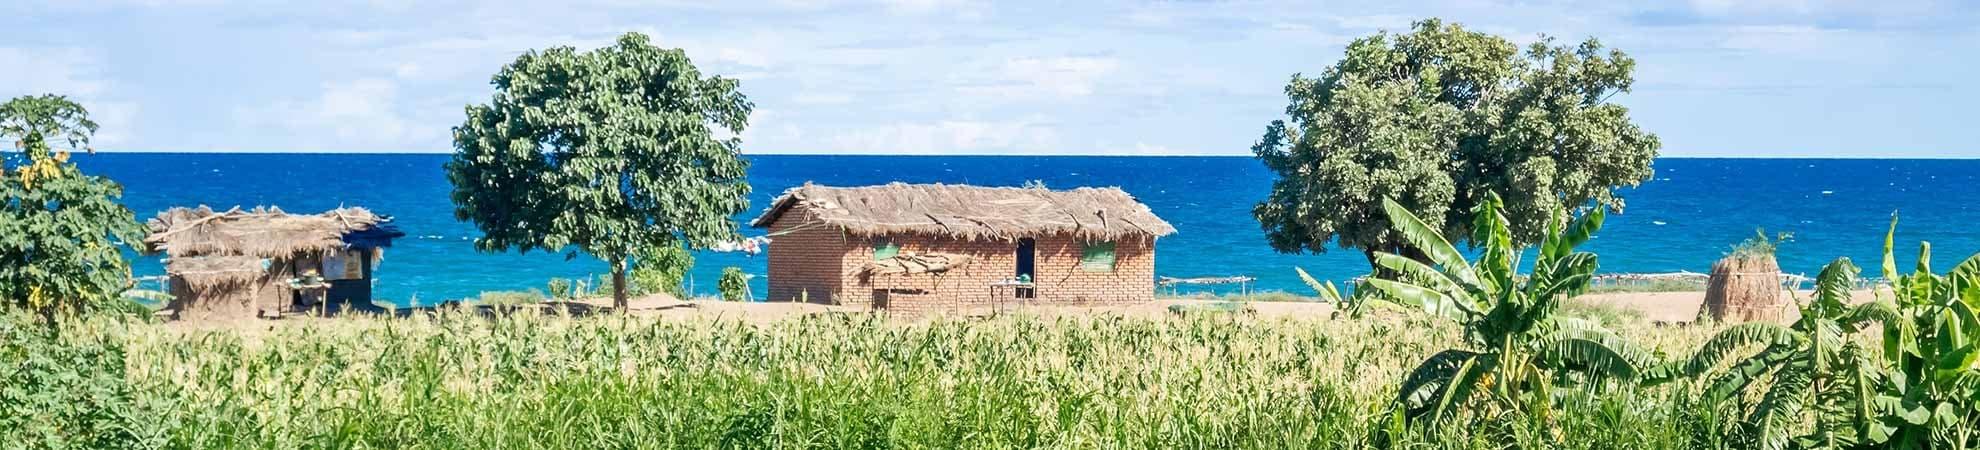 Voyage Malawi